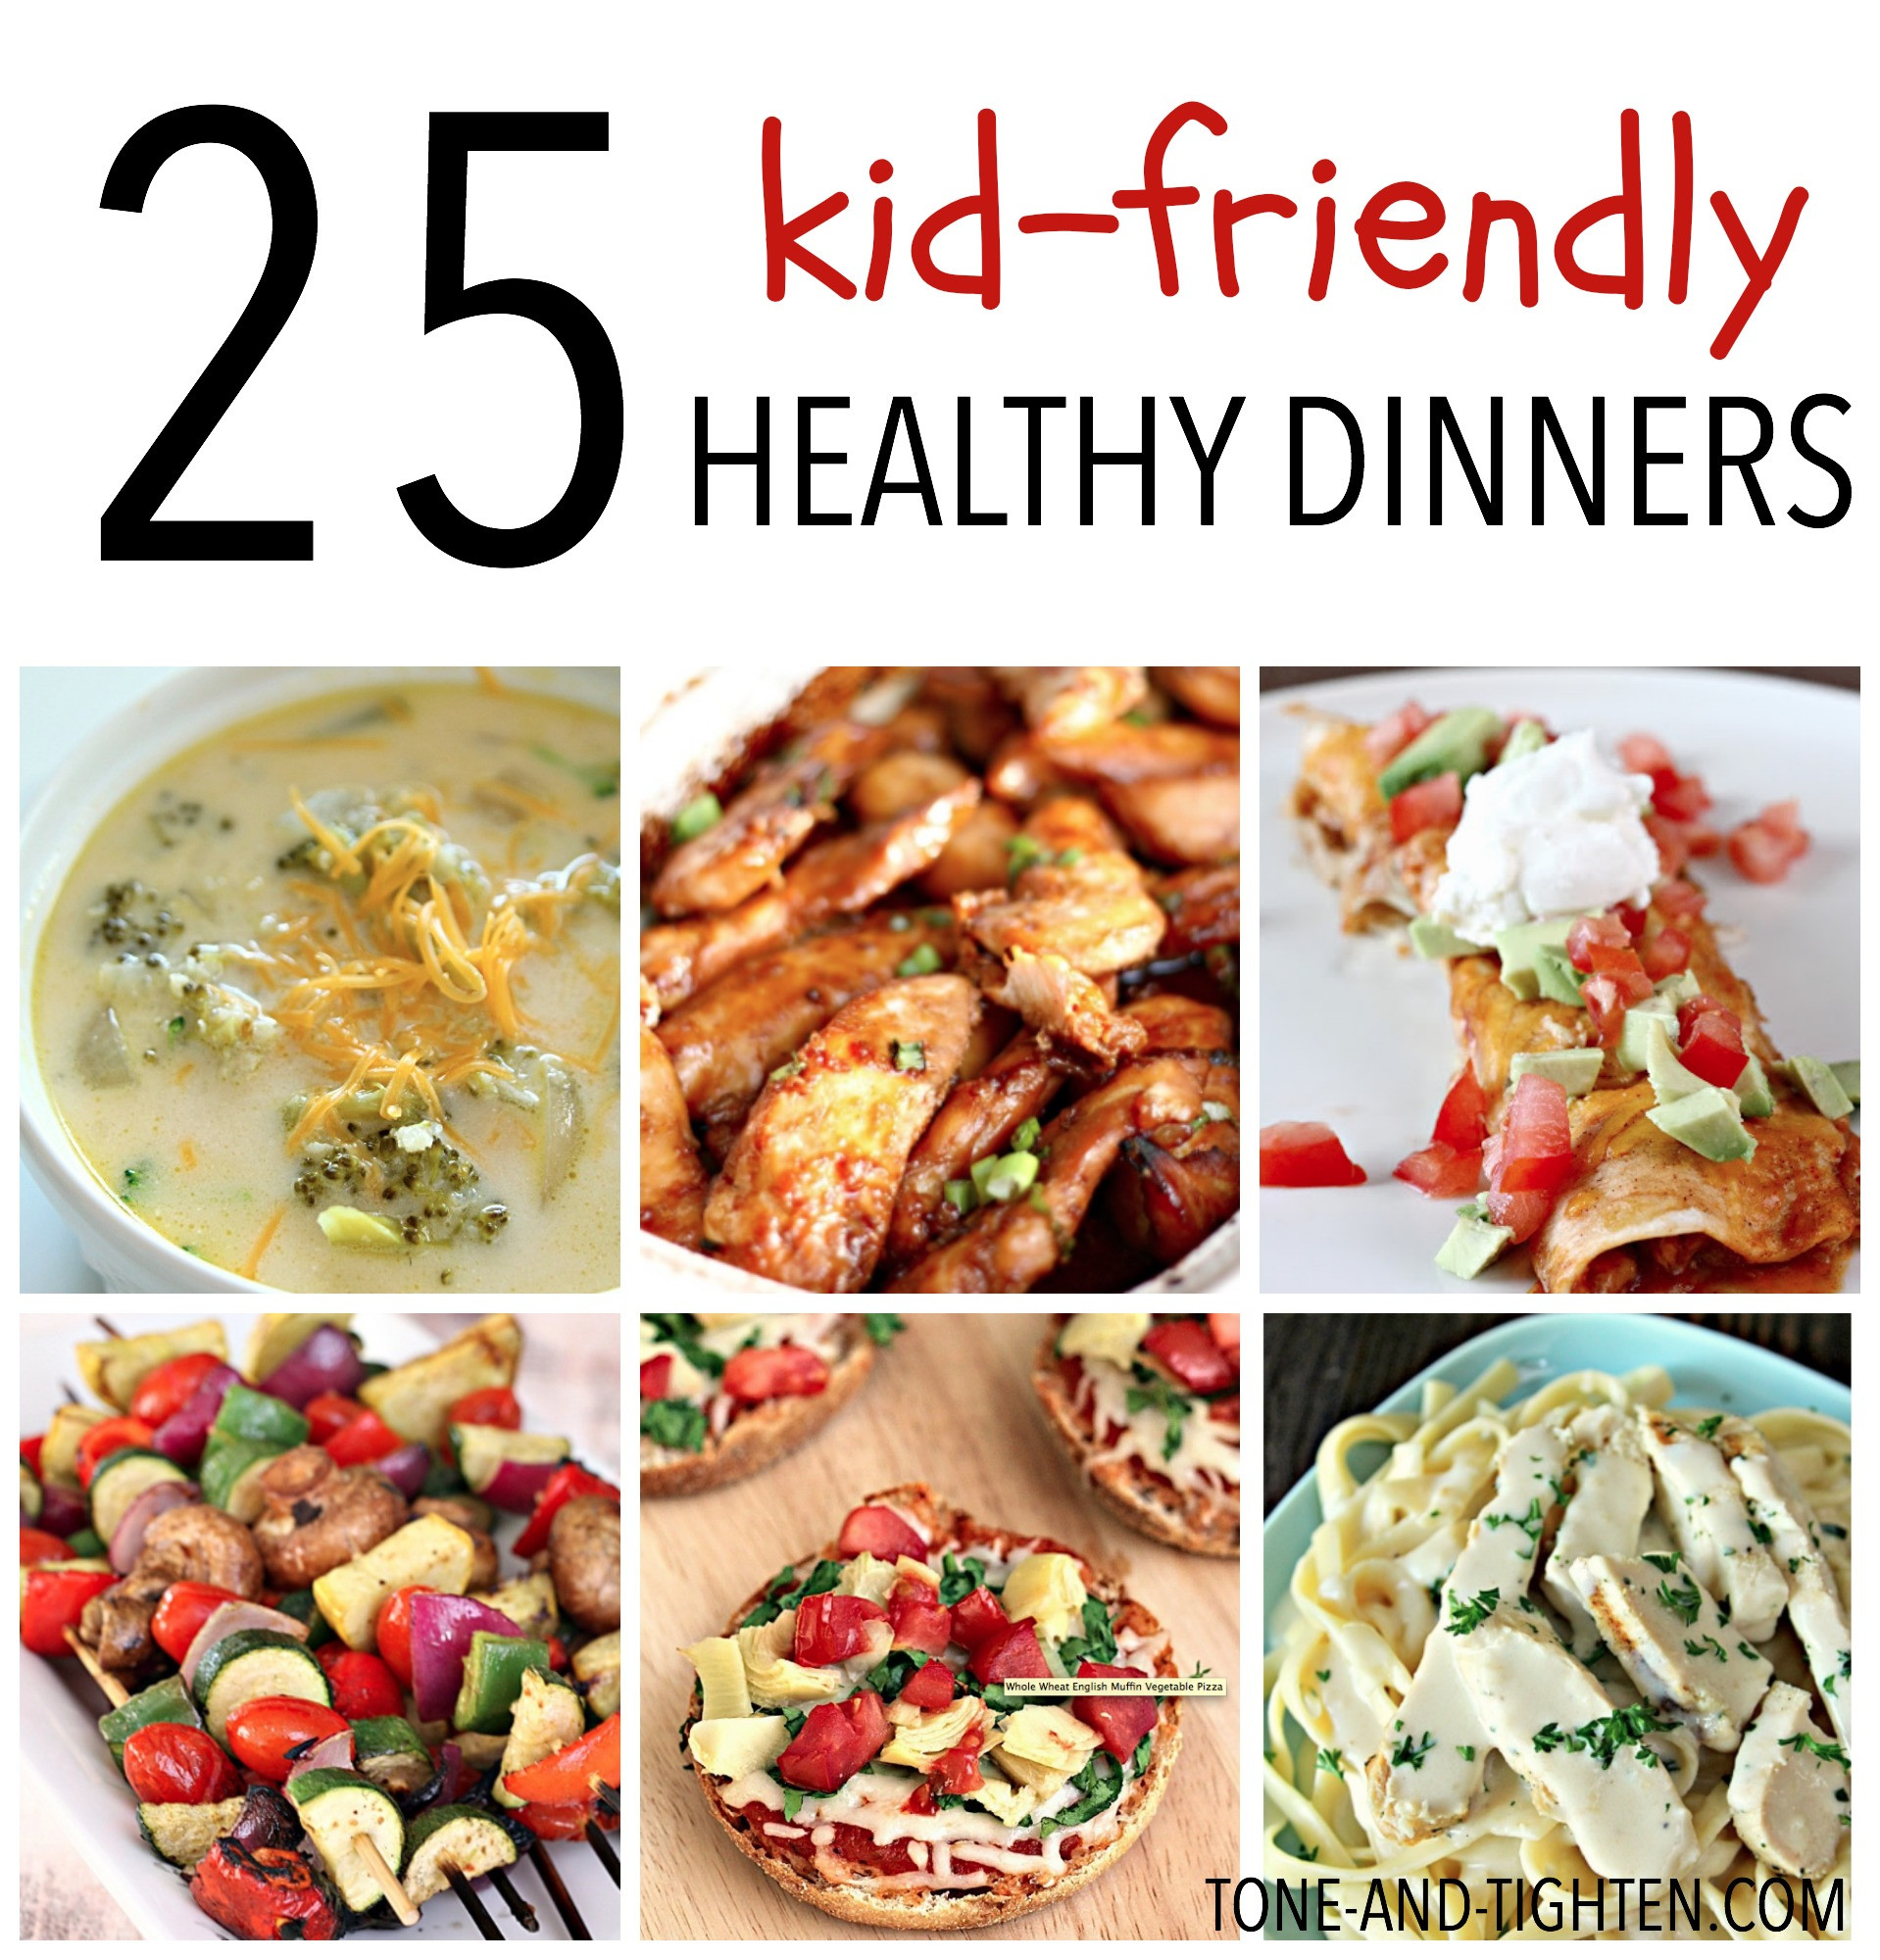 Easy Healthy Dinner Recipes Kid Friendly  25 Kid Friendly Healthy Dinners